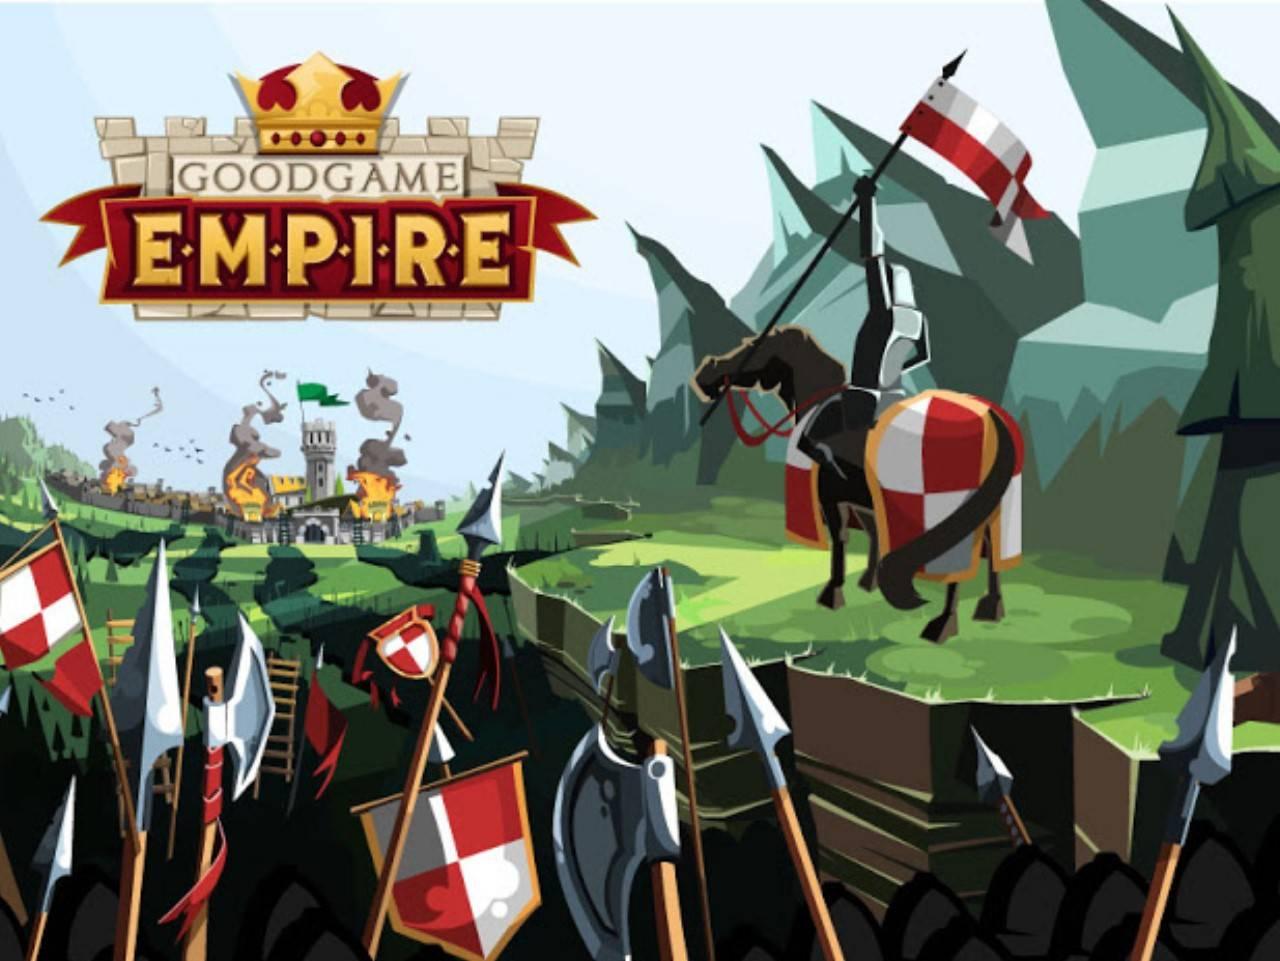 Goodgame Empire Wallpapers Goodgame Empire